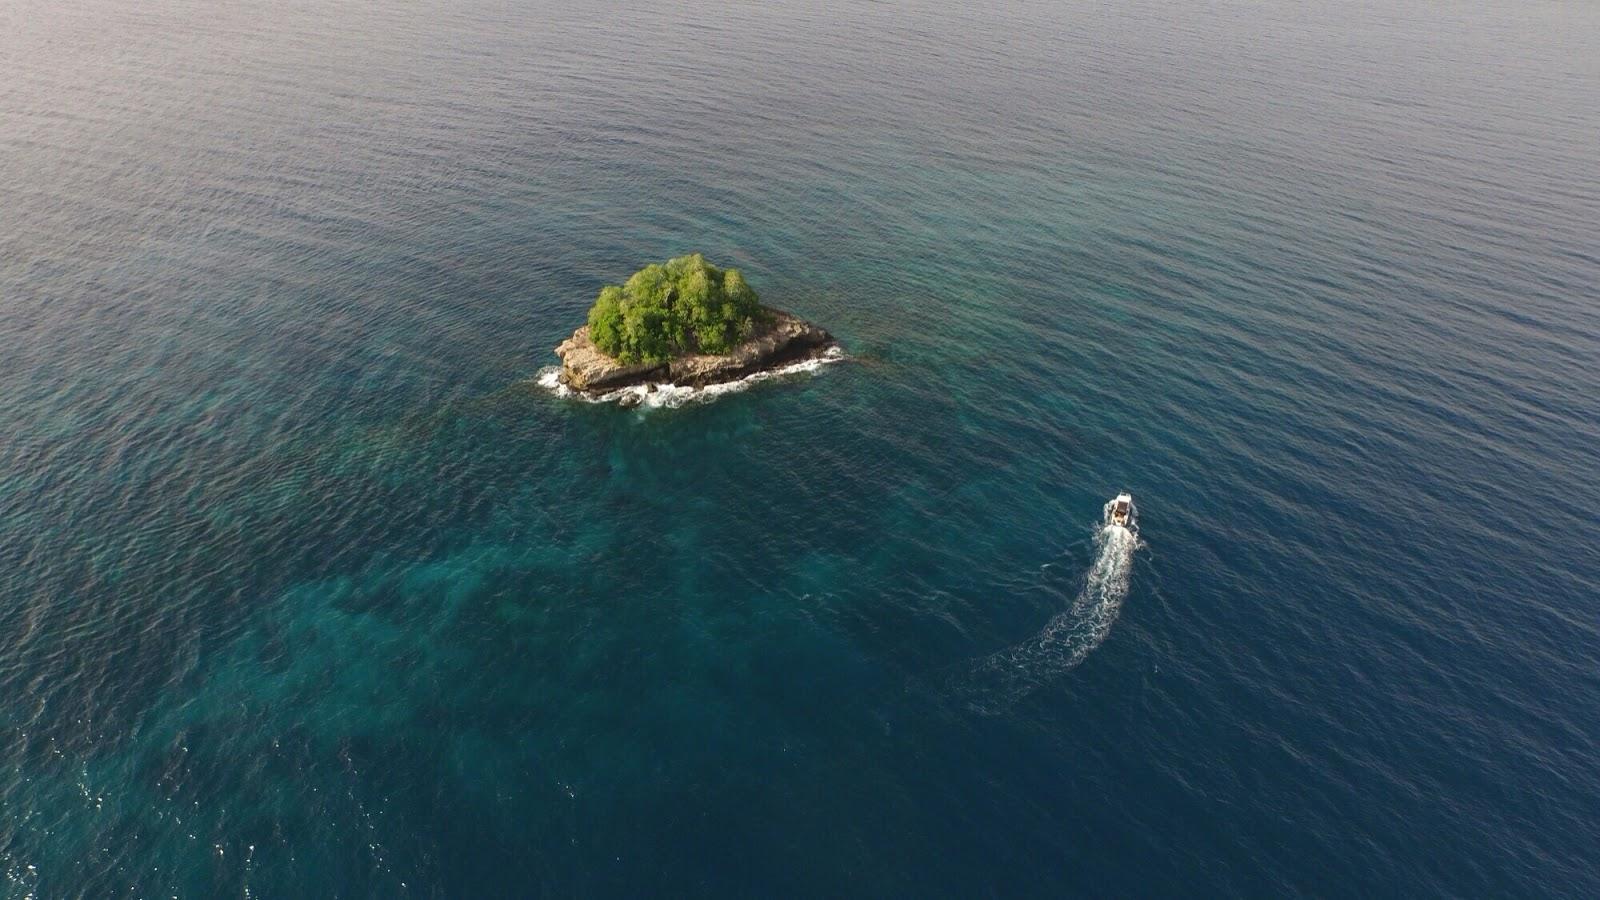 Weekdays Traveler Racun Minahasa Tenggara Pulau Difoto Udara Salah Satu